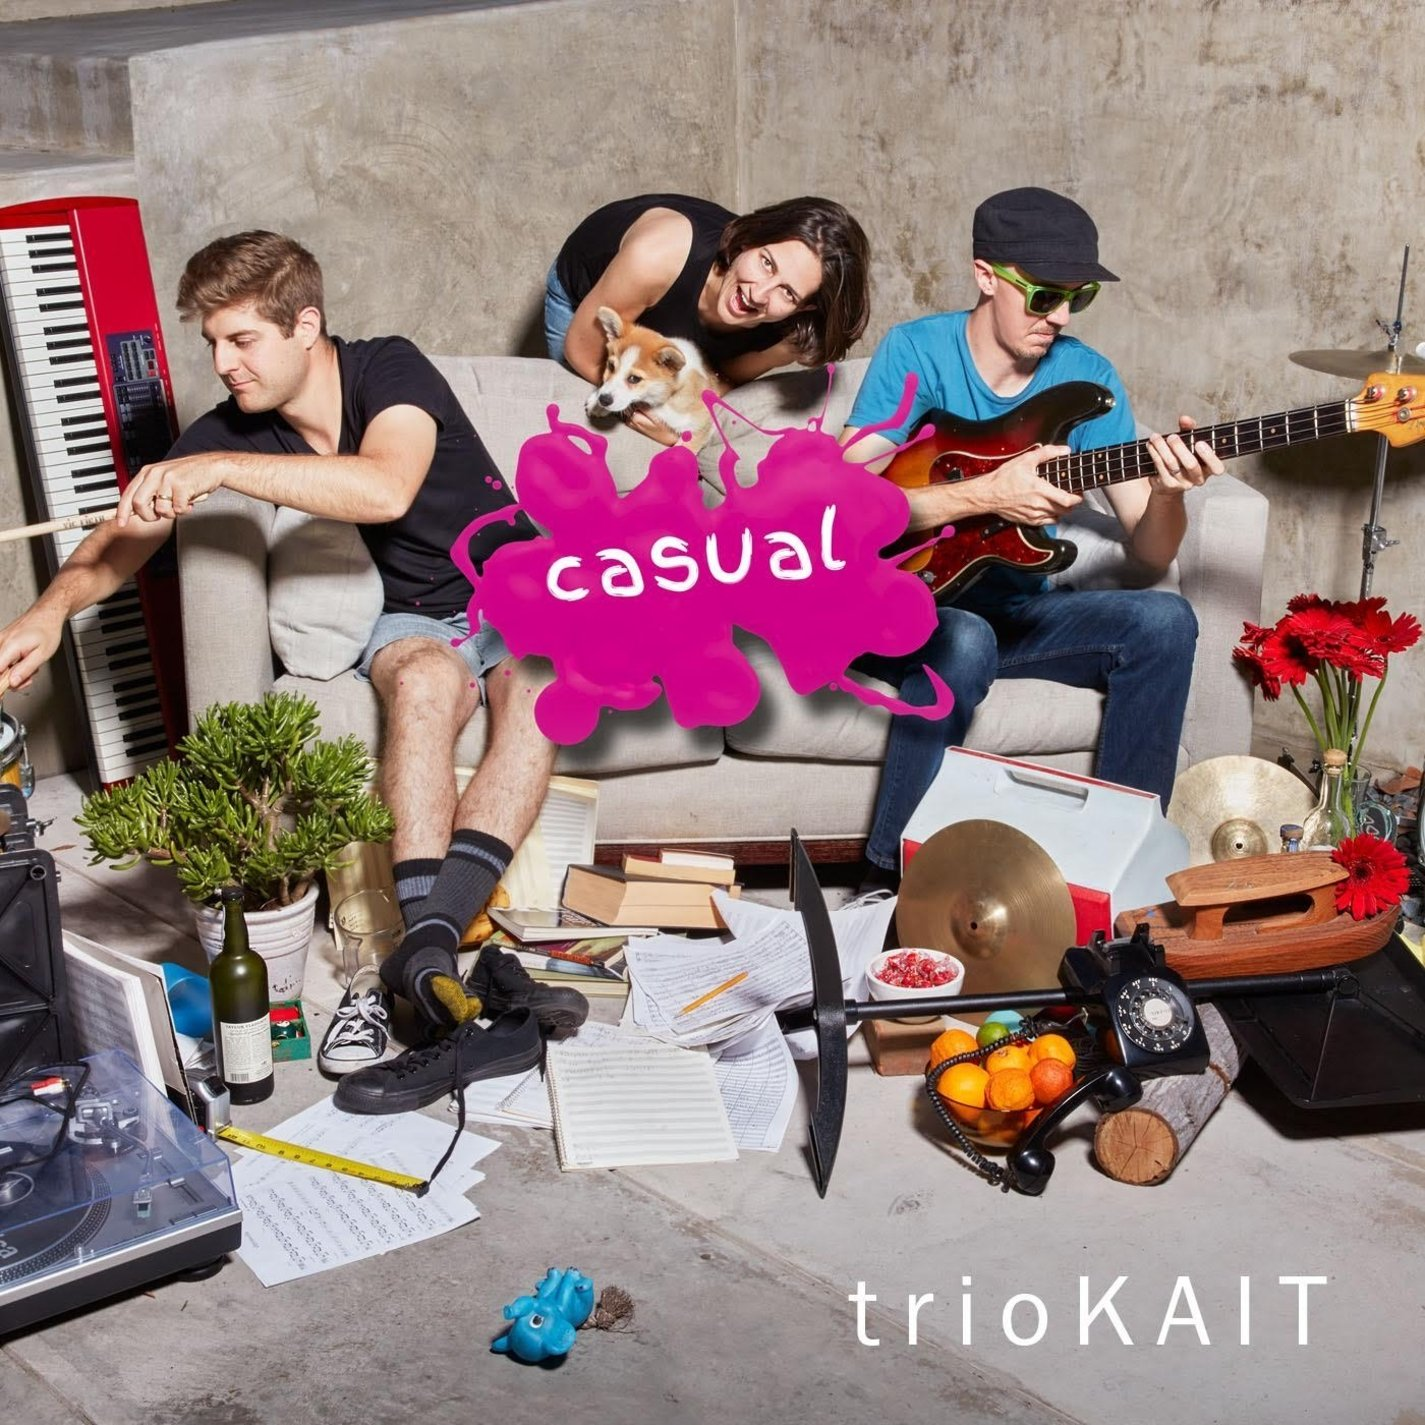 Triokait Casual: Kait Dunton: Amazon.es: Música